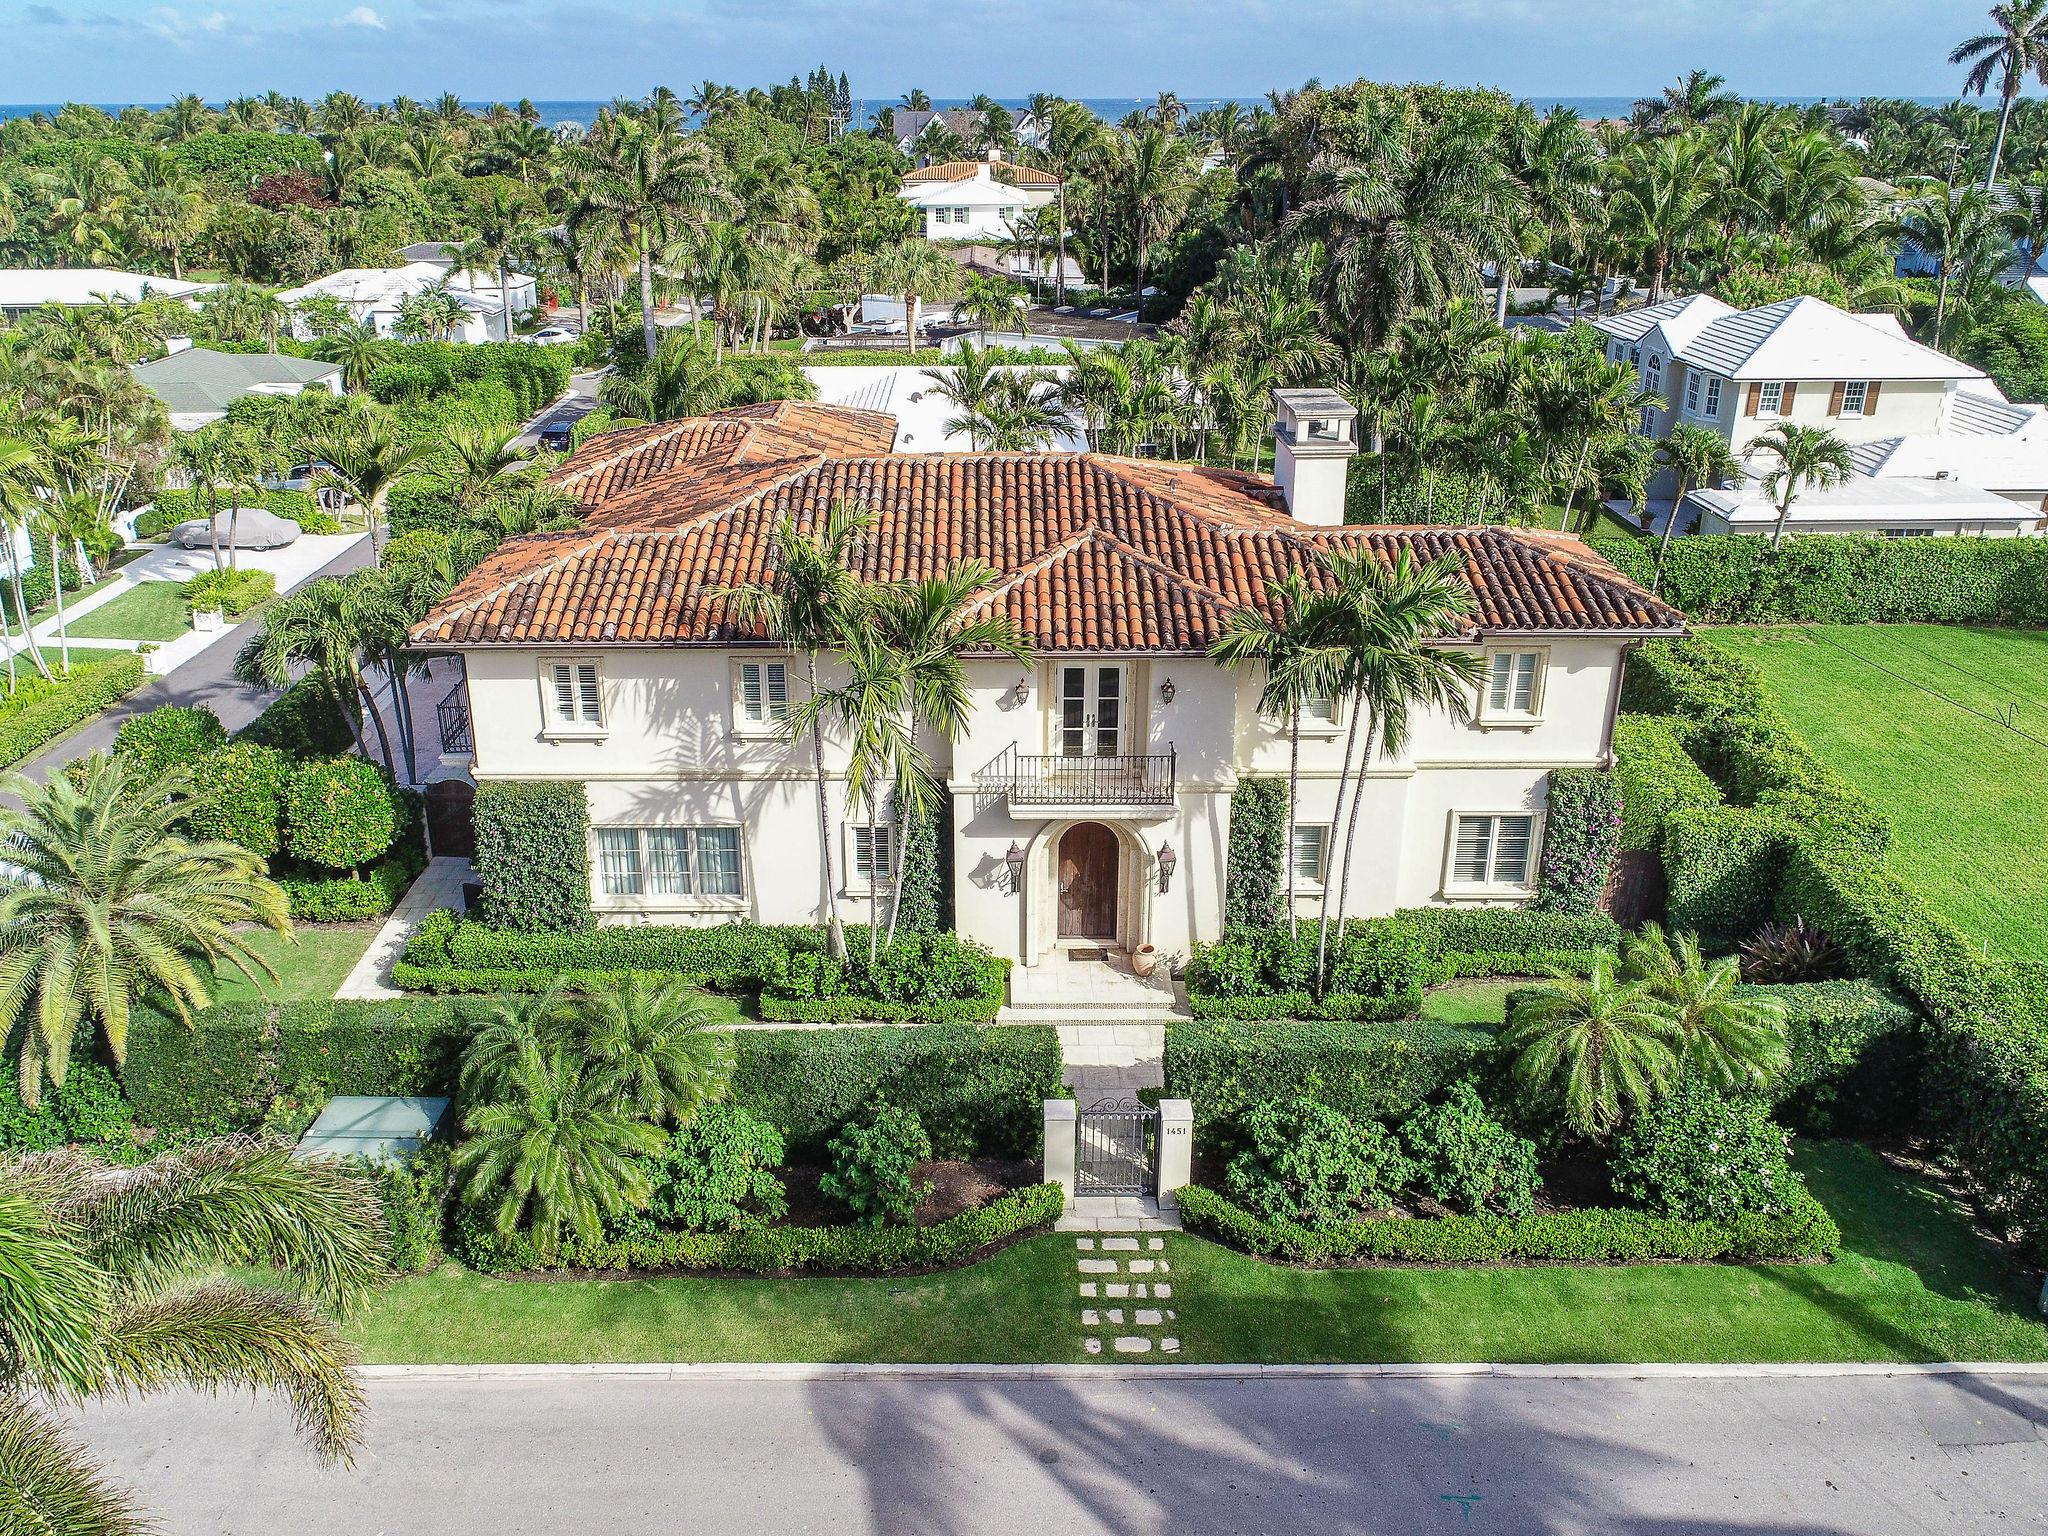 1451 N Lake Way - Palm Beach, Florida